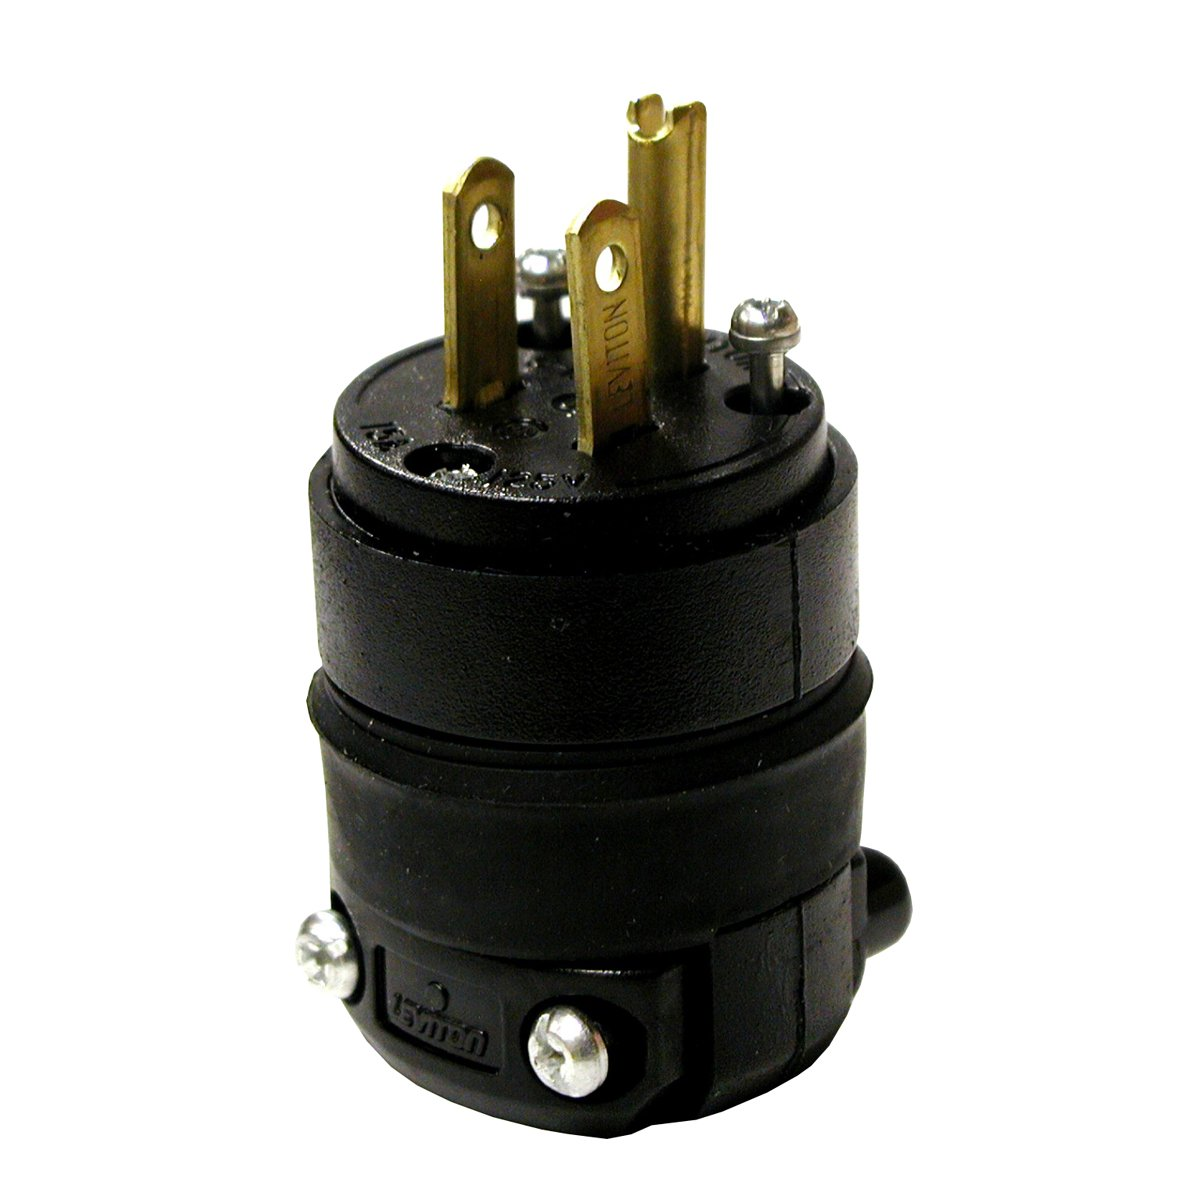 Leviton 515PR 15 Amp 125 Volt, Straight Blade Rubber Plug, NEMA 5-15P, Black